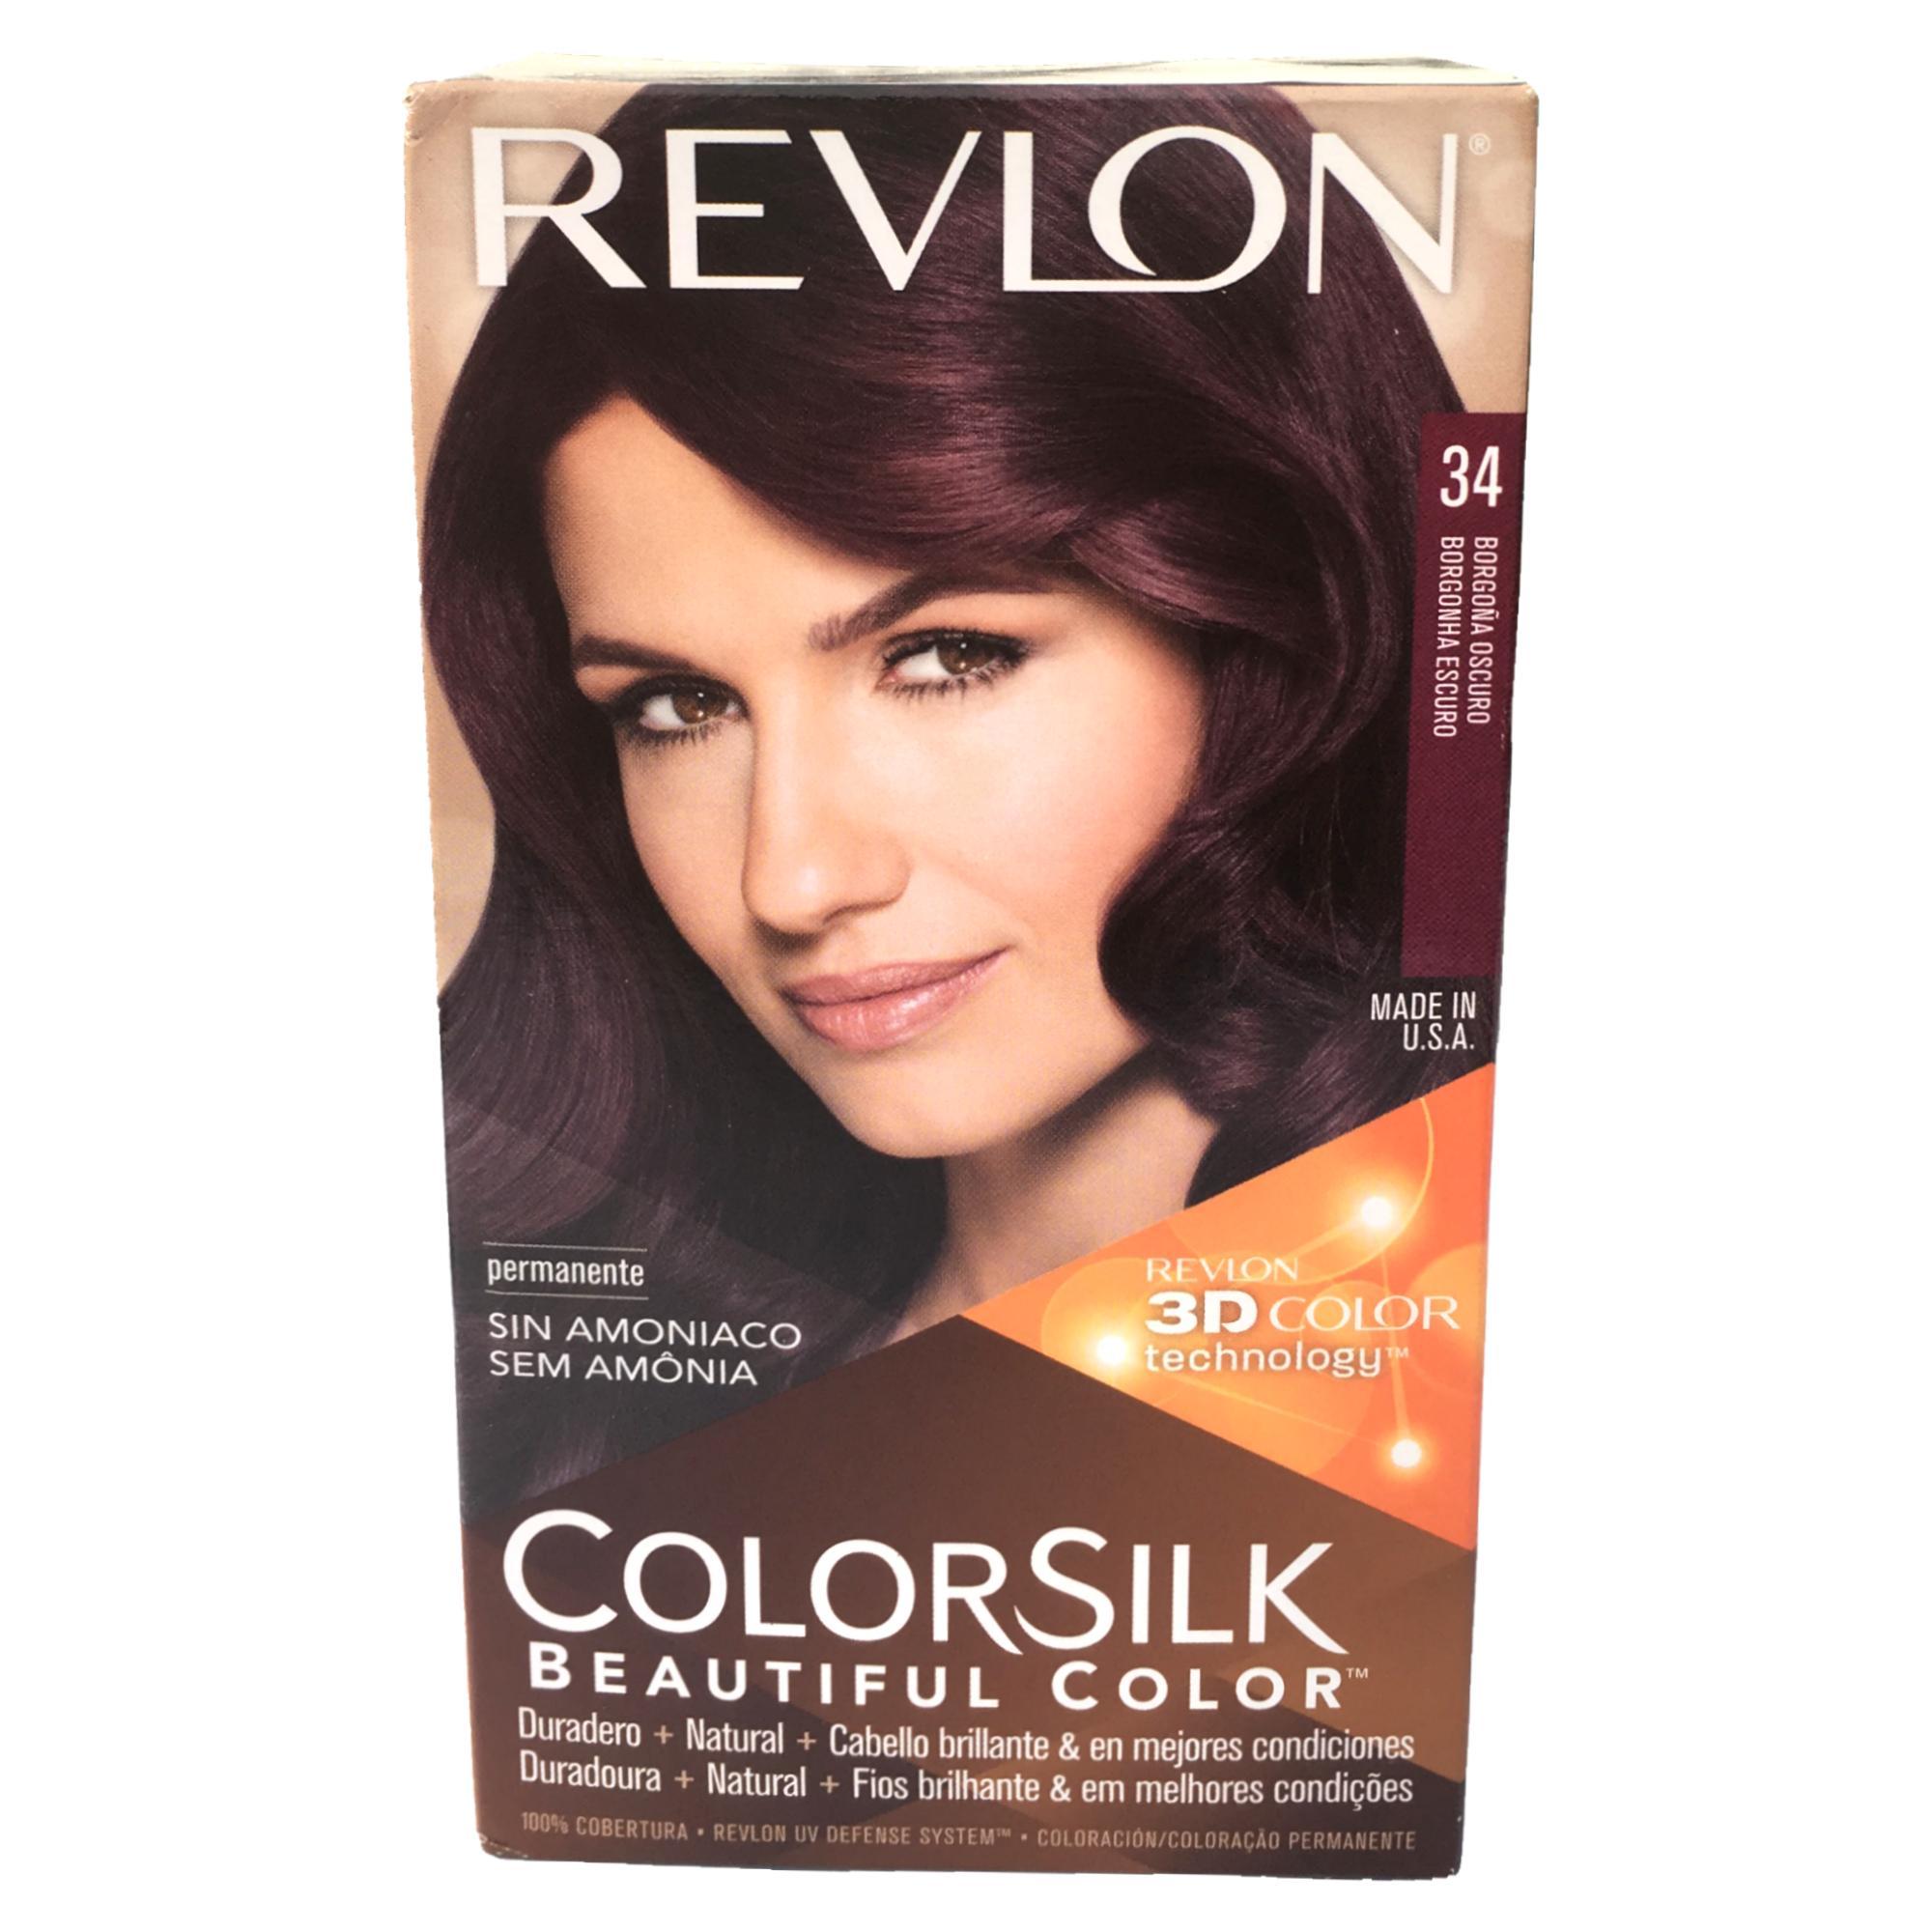 Hair Color Online In Bangladesh At Best Price Bigen Speedy 2 X 30gr Revlon Colorsilk Beautiful